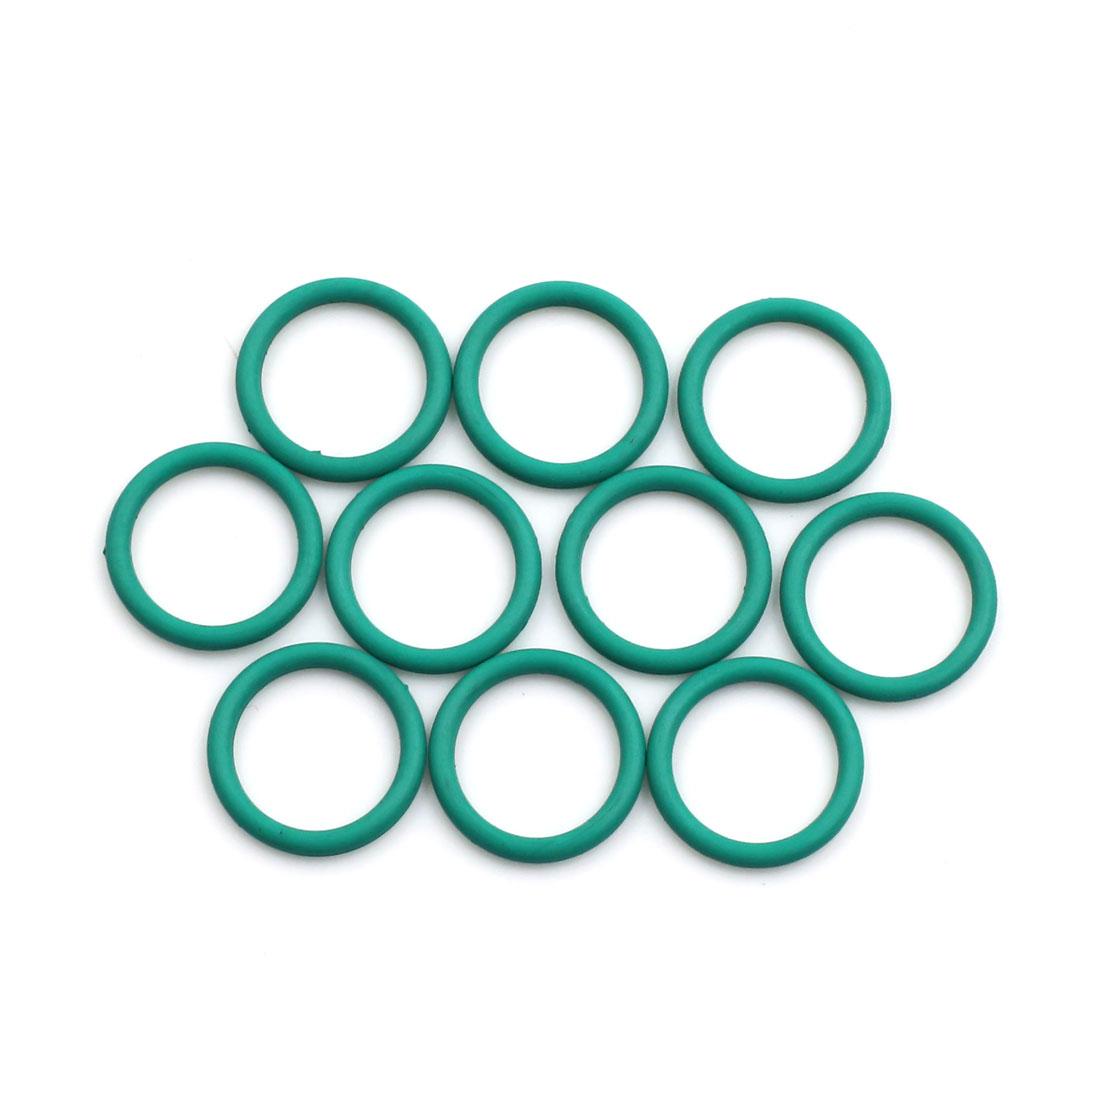 10pcs Green Universal FKM O-Ring Sealing Gasket Washer for Car 17mm x 2mm